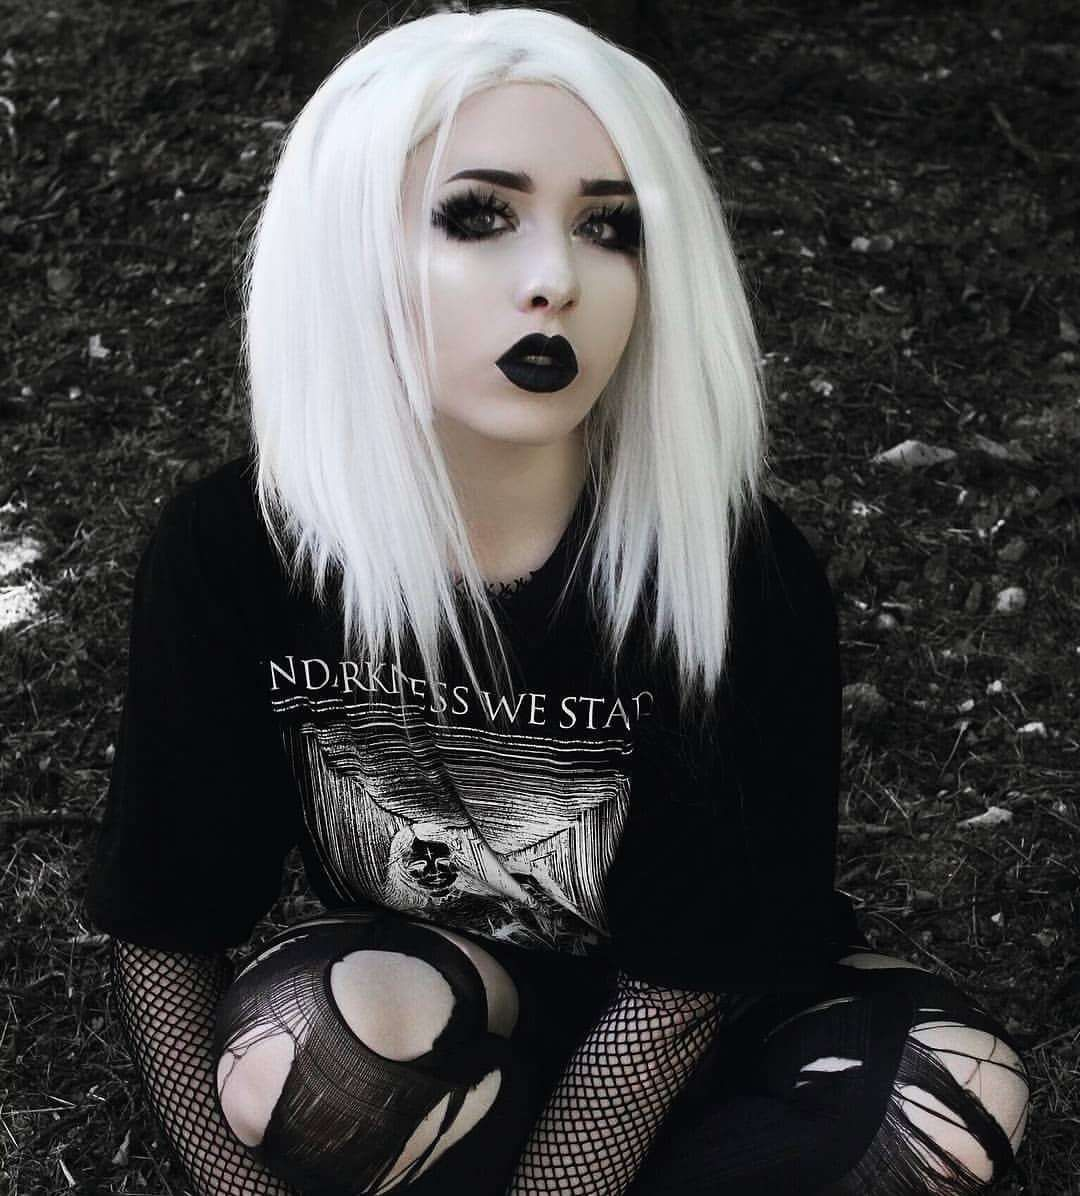 Best Emo Hairstyles 2019 Gothic Hairstyles Emo Girl Hairstyles Emo Hair